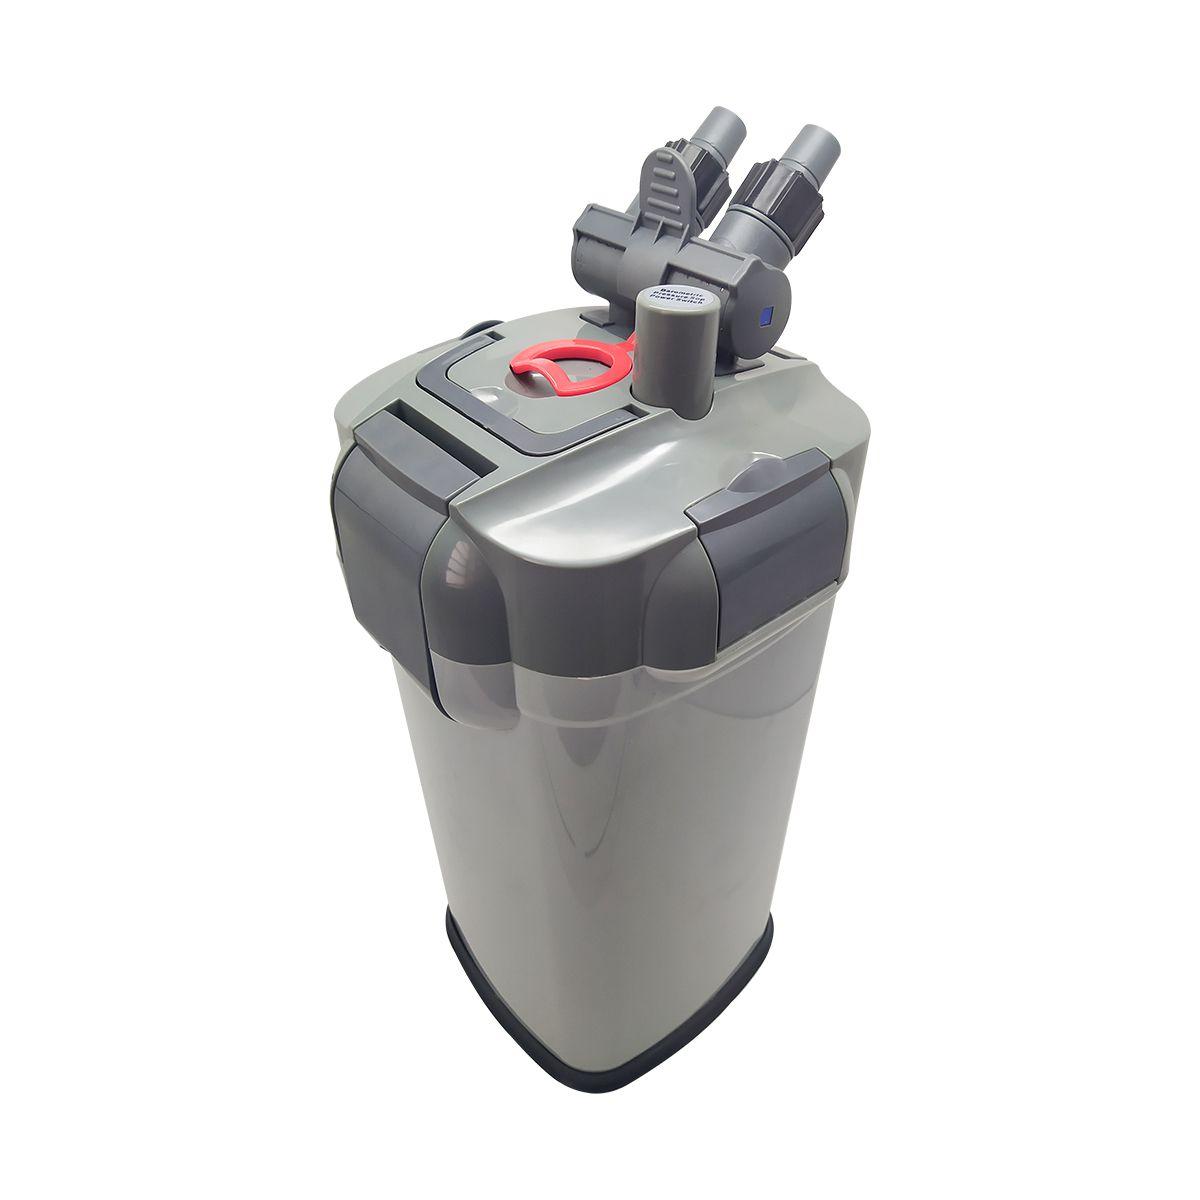 Hopar Canister Kf 2208 800l/h 2 Cestas + Mídias 110v +brinde